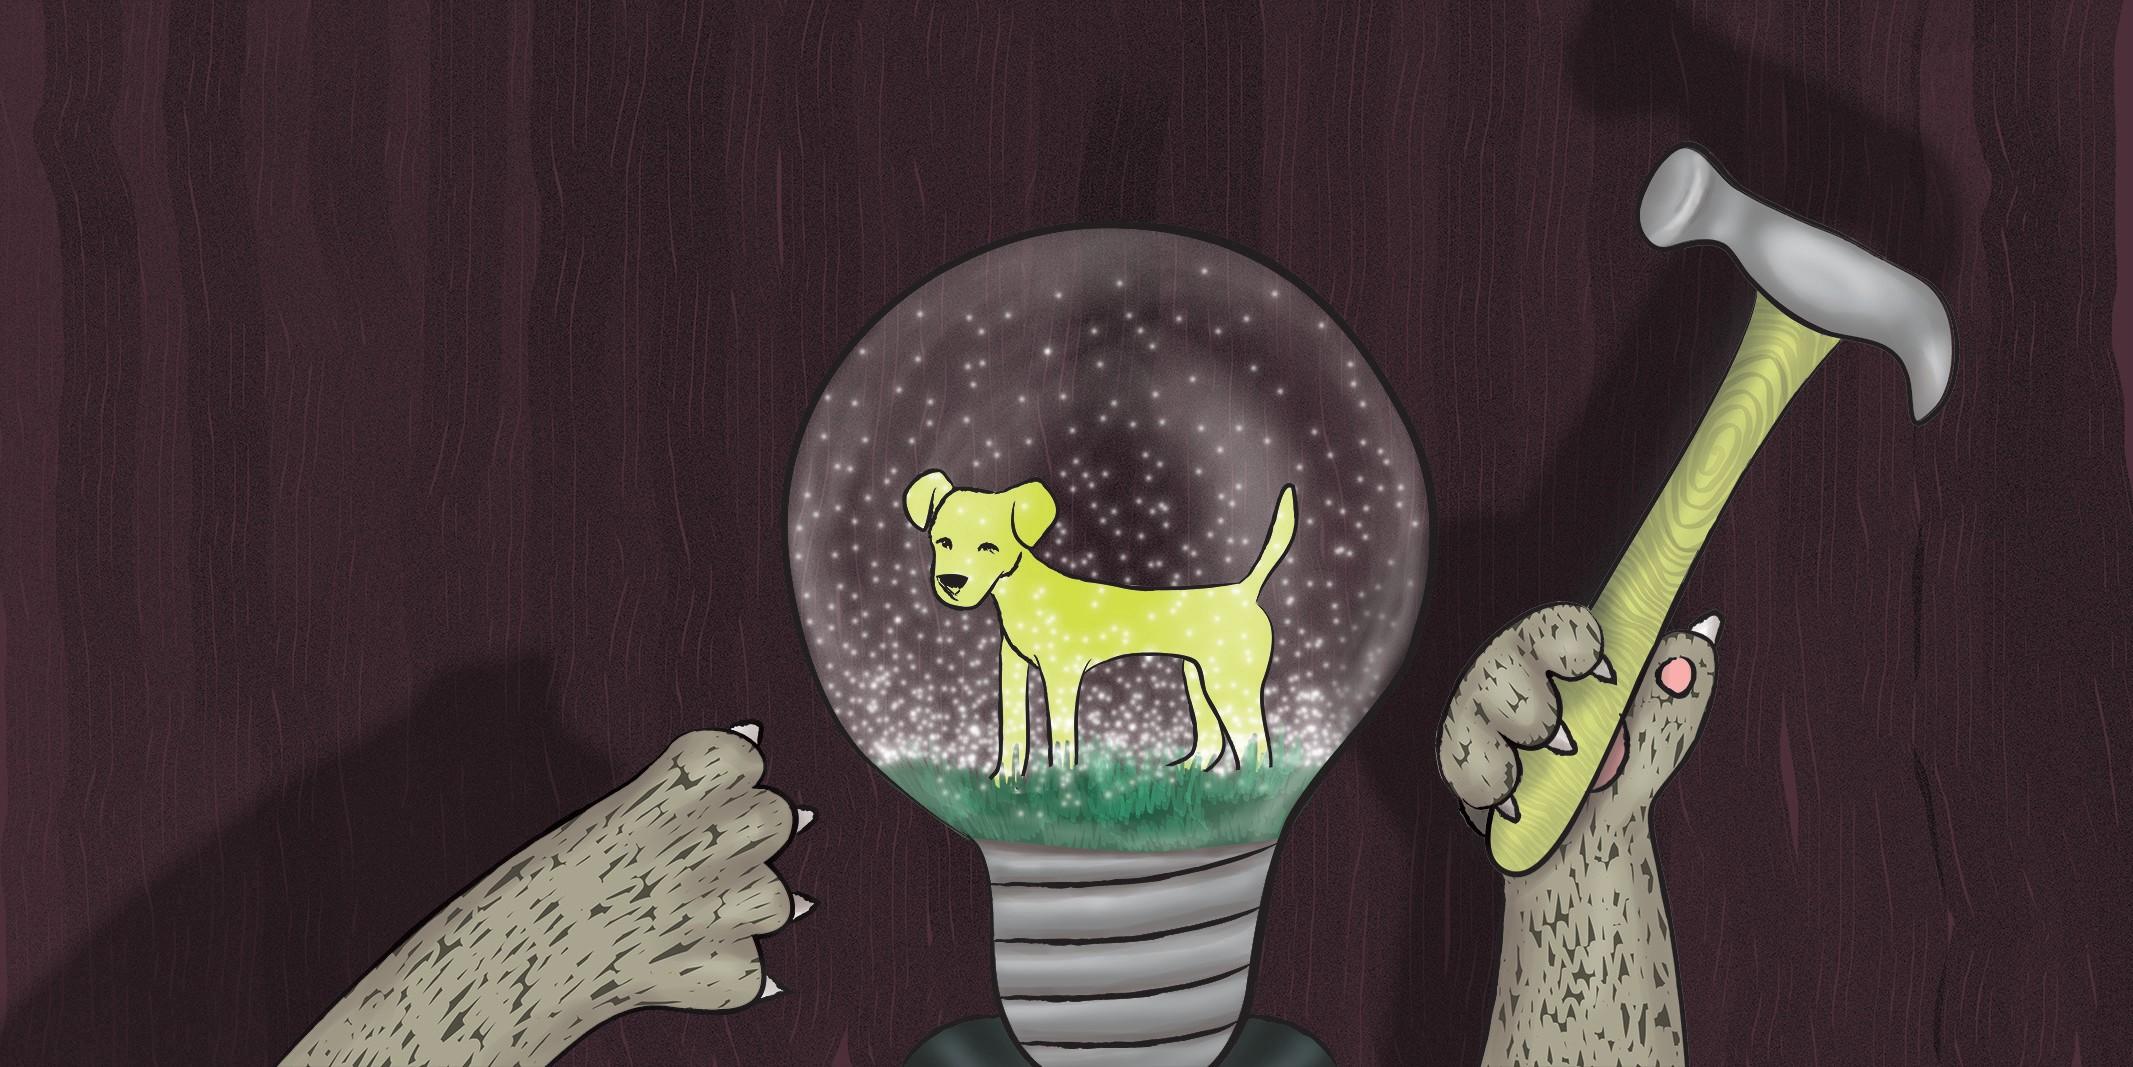 Inside The Bulb: Adventures in Reverse Engineering Smart